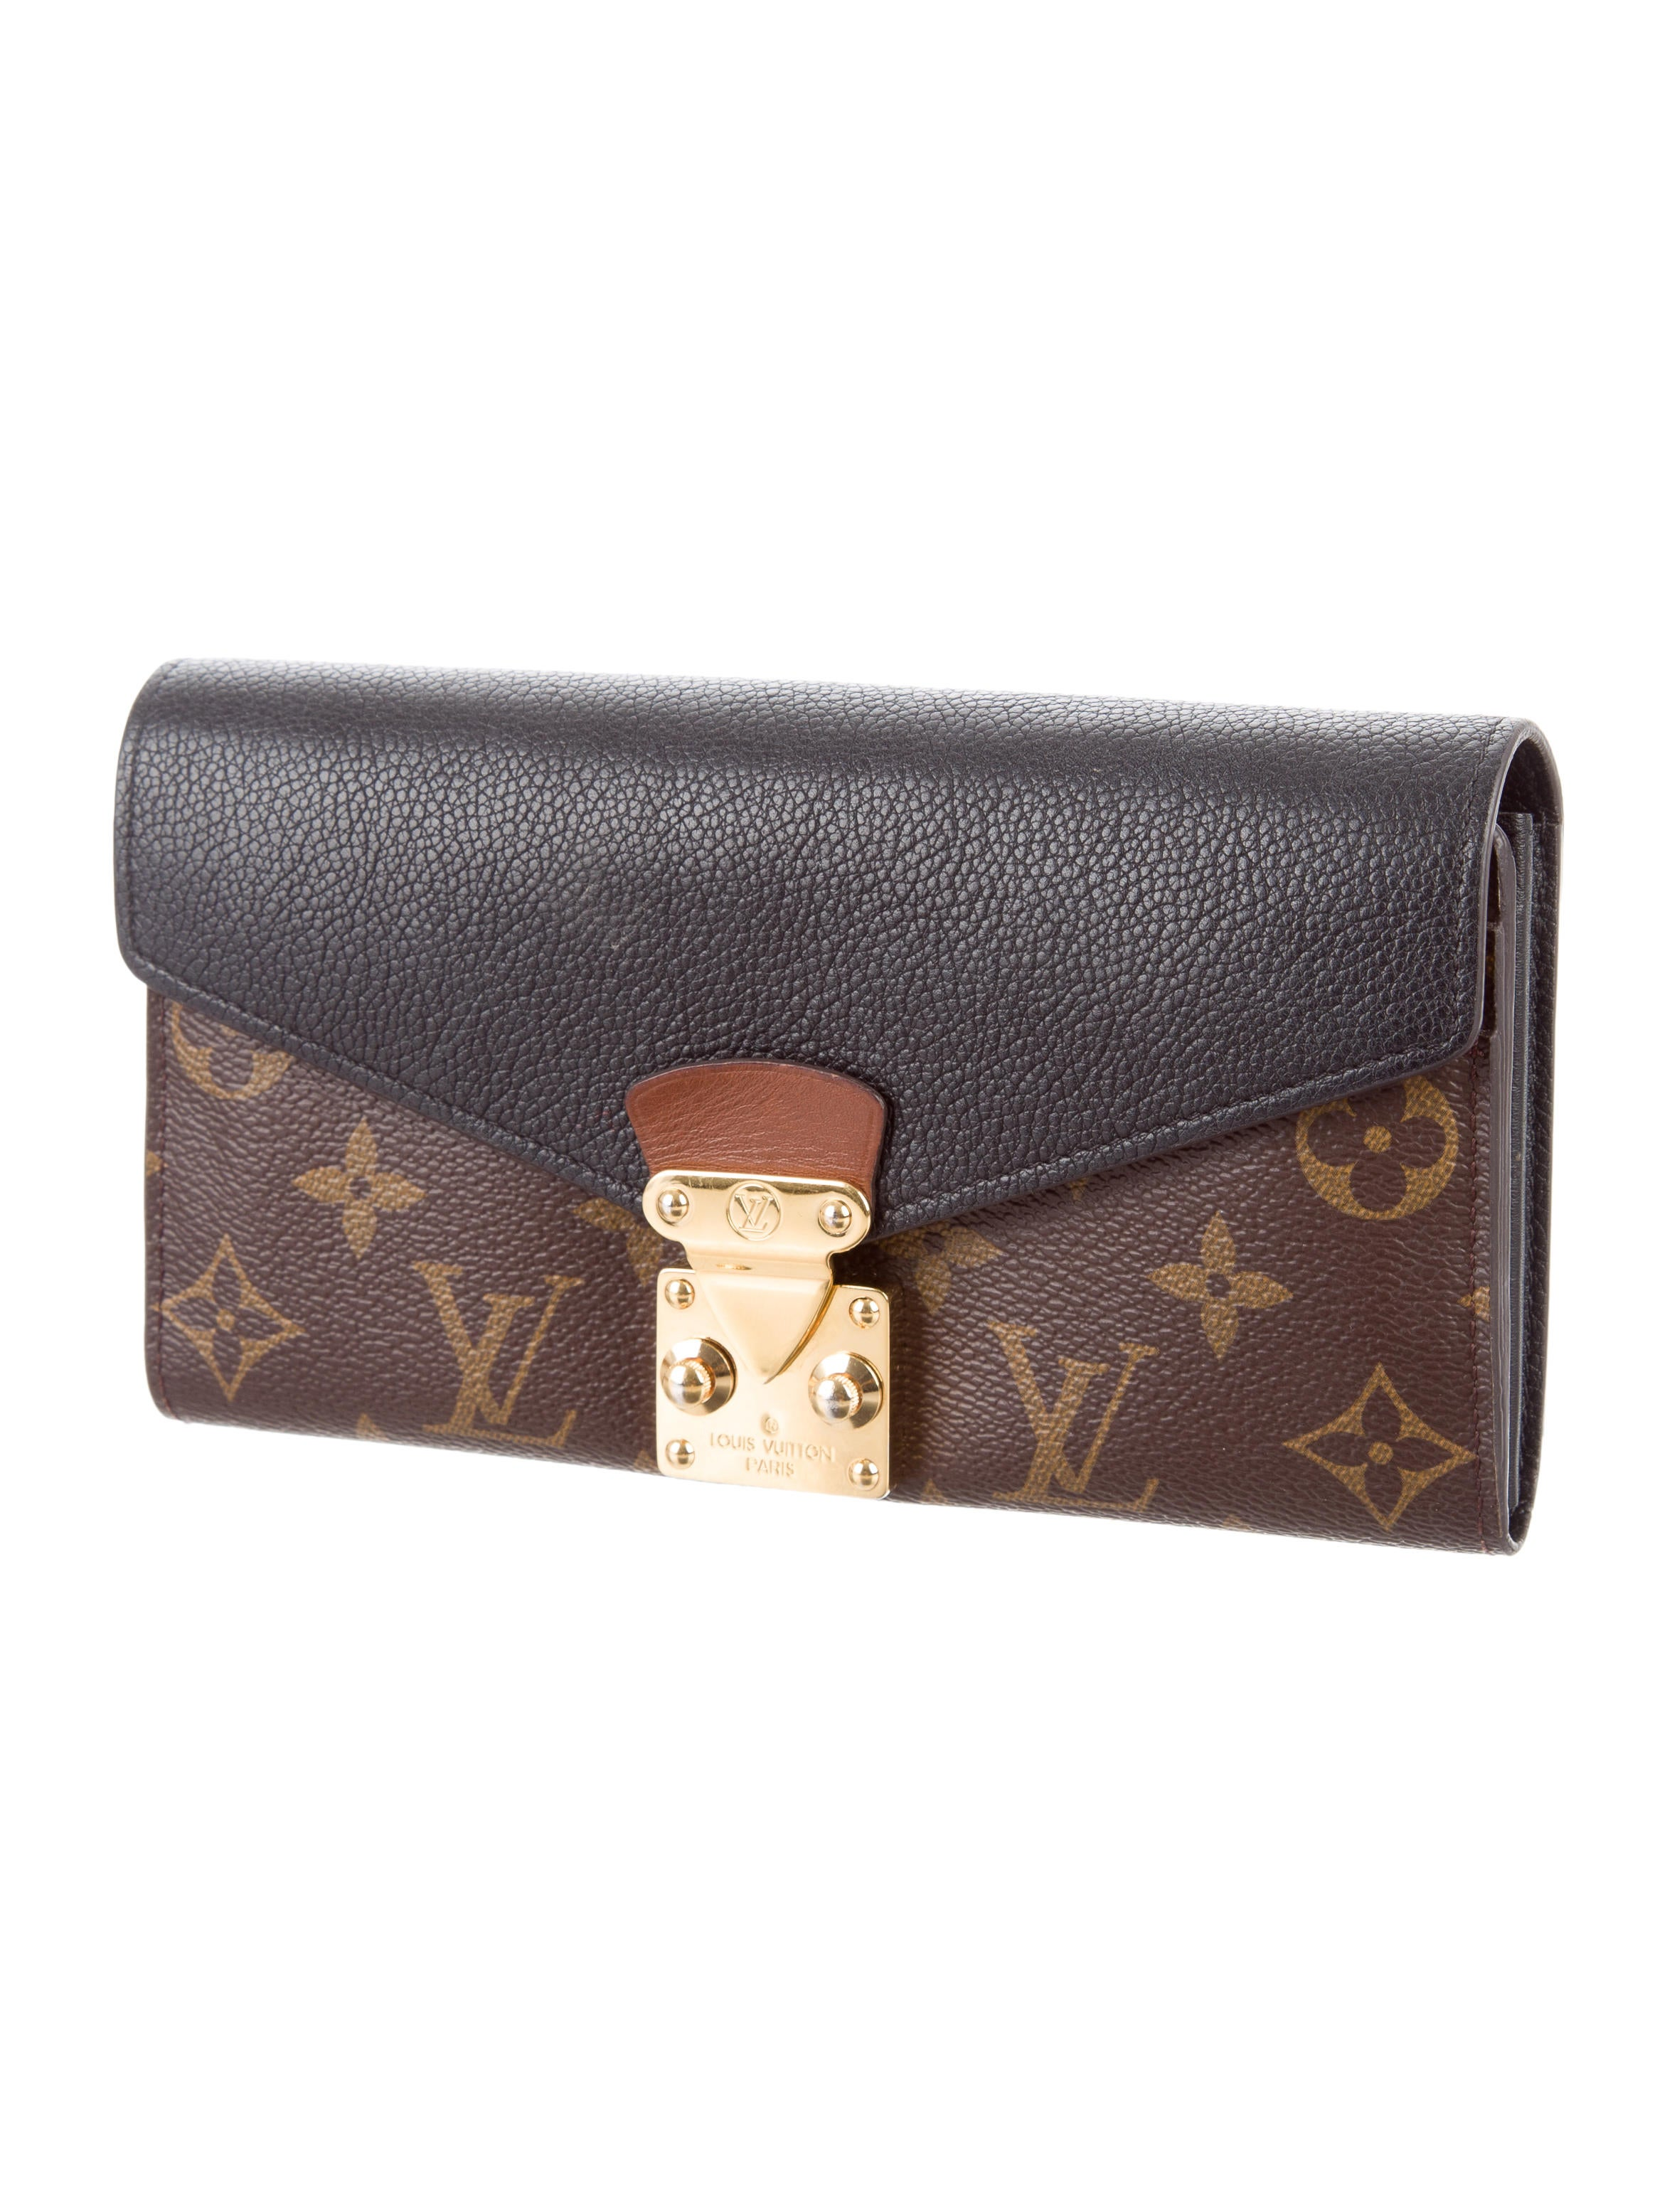 Louis Vuitton 2015 Monogram Pallas Wallet